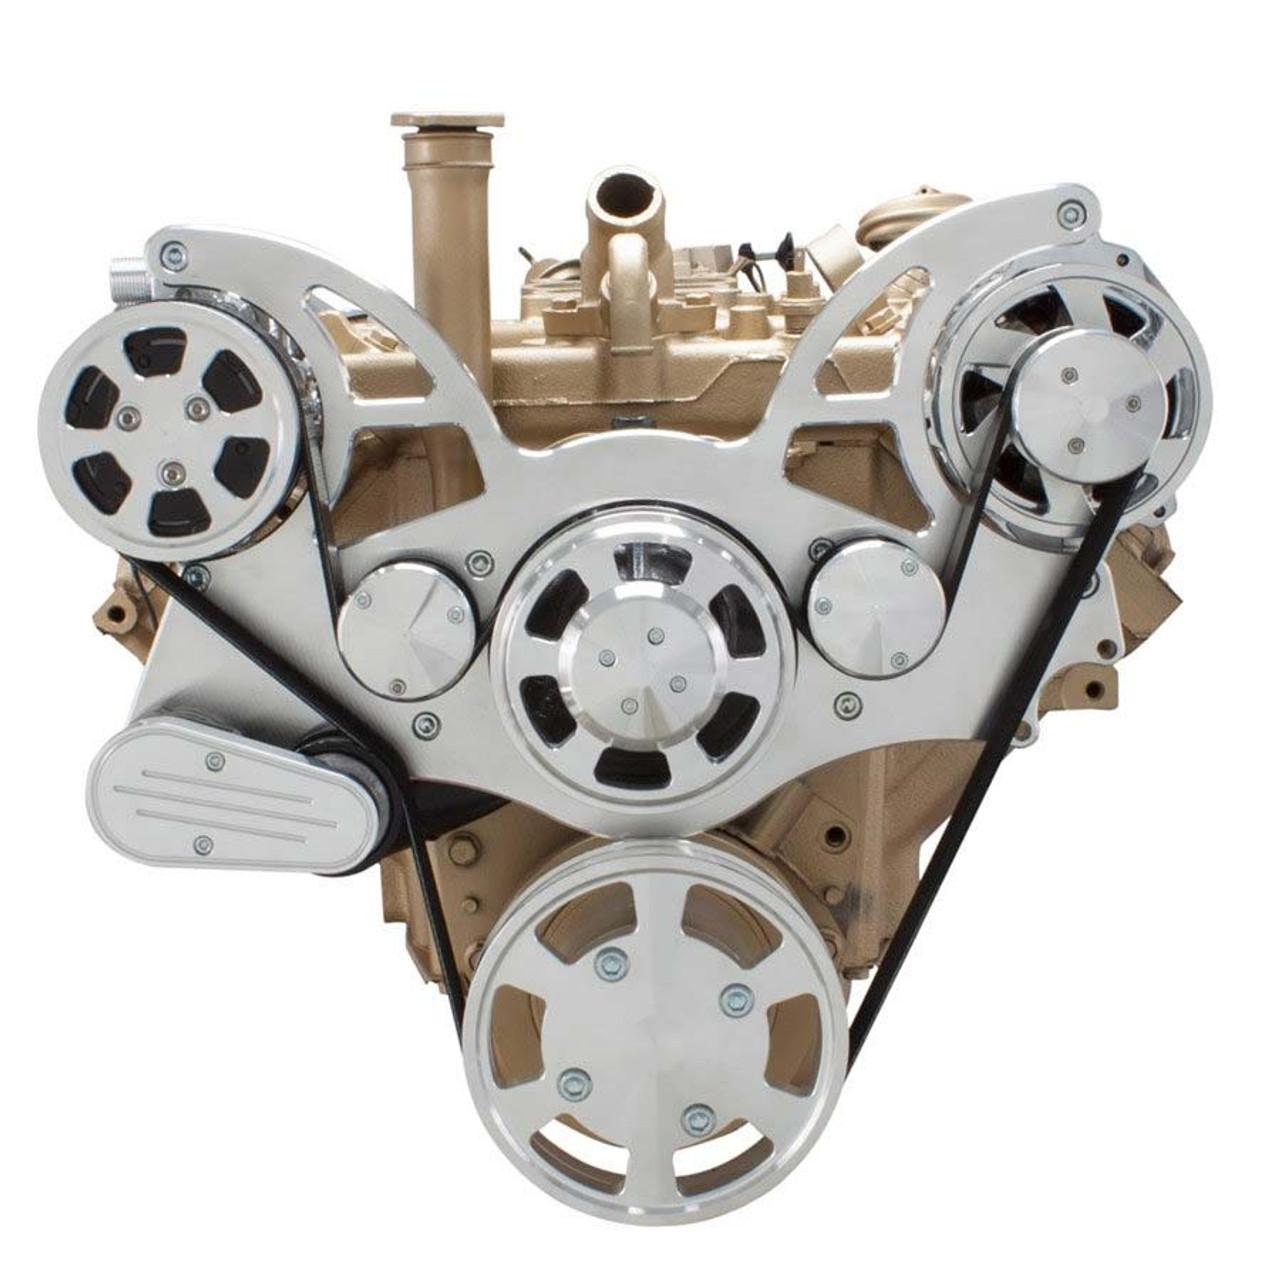 serpentine system for oldsmobile 350 455 ac alternator  [ 1280 x 1280 Pixel ]